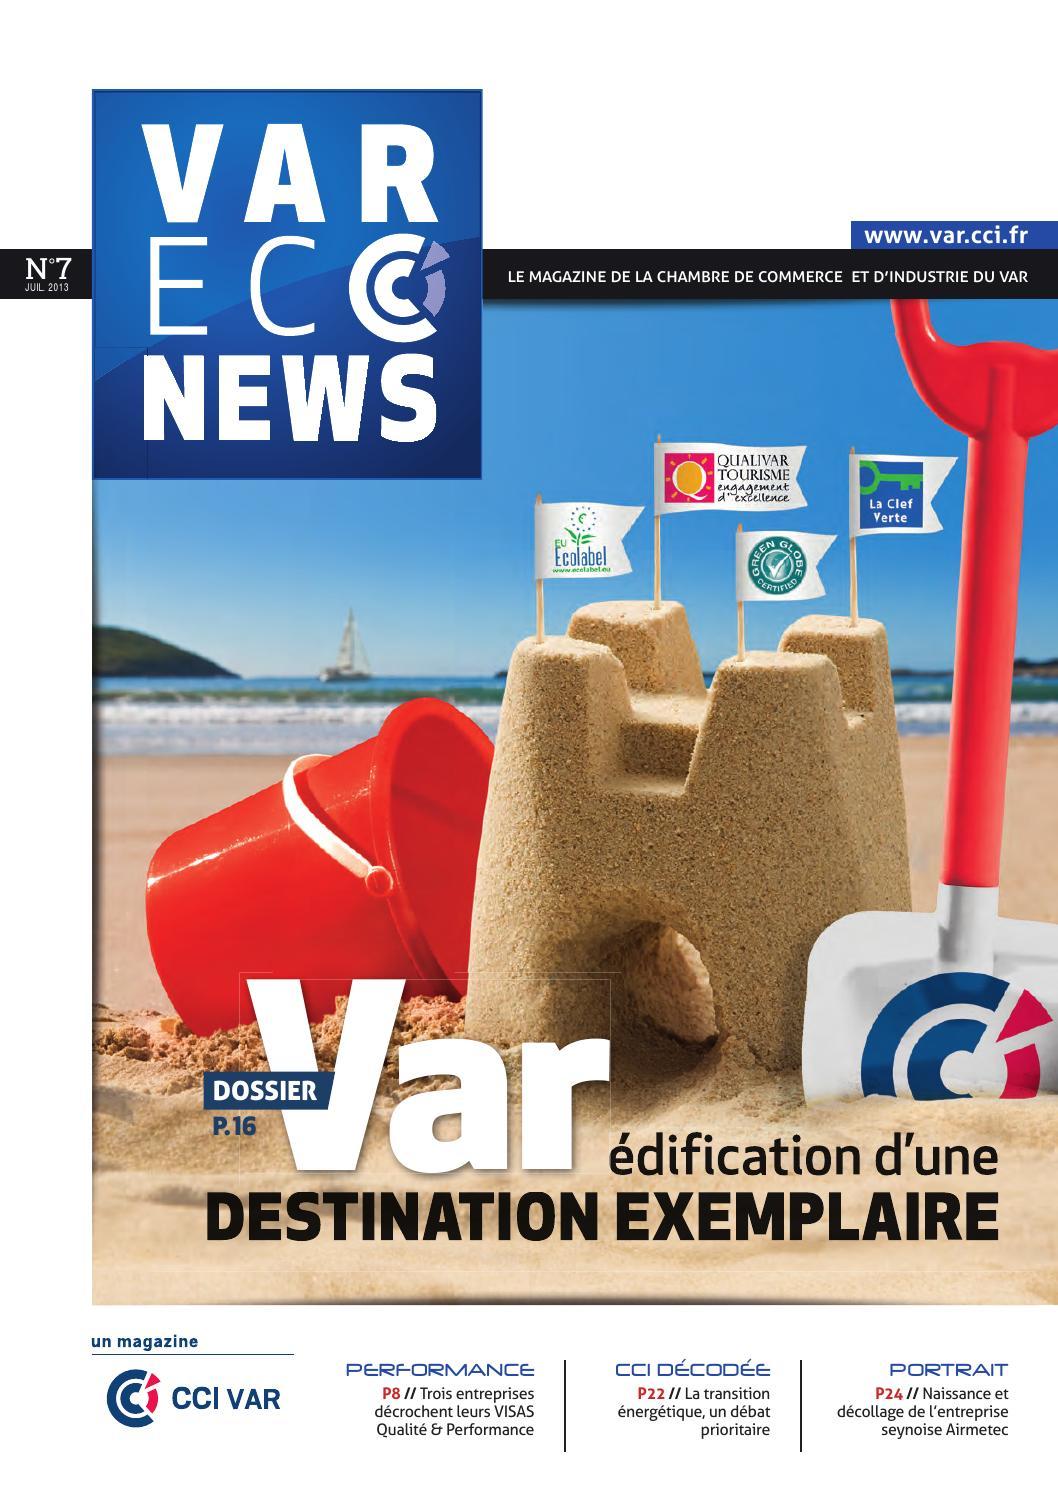 Var Eco News n°7 by CCI du Var - issuu a9dc9a69b9d